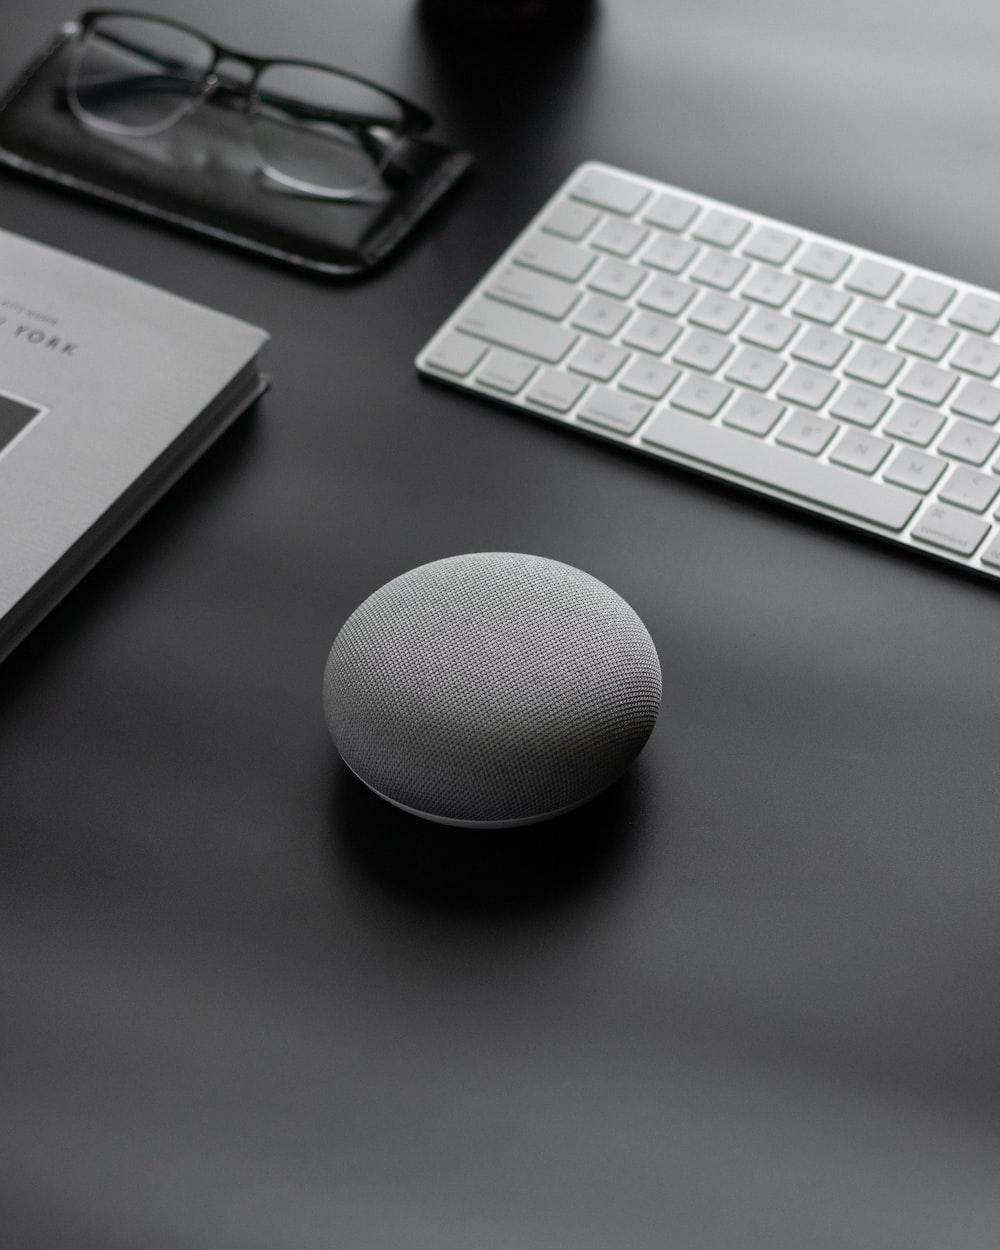 round gray Google Home Mini speaker